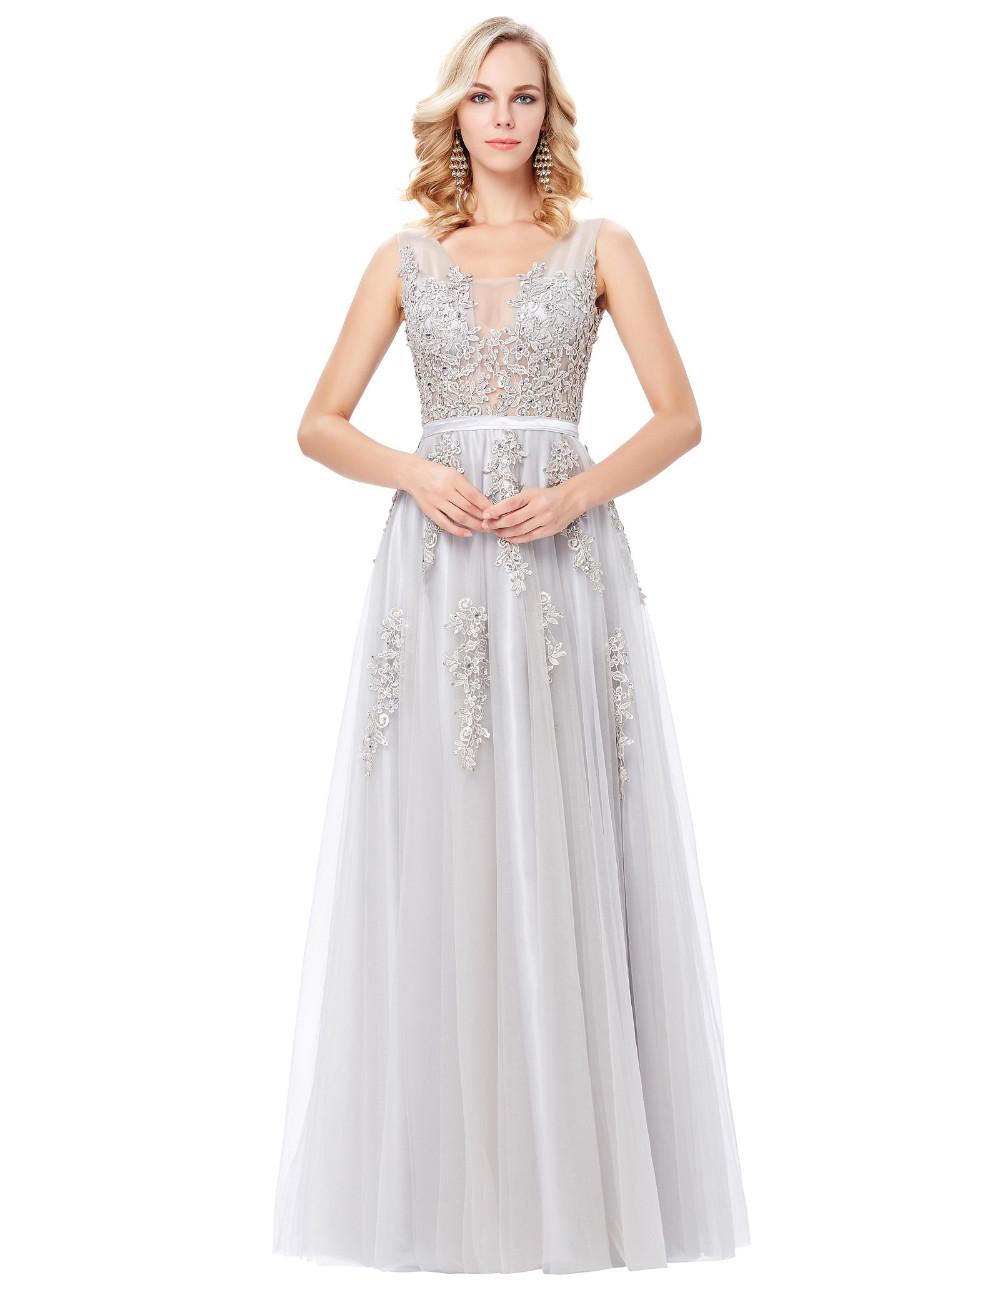 Grace Karin Tulle Appliques Celebrity Prom Dress Sexy V Back Sleeveless Long Royal Blue Robes De Soiree 2017 Longue Prom Dresses 21